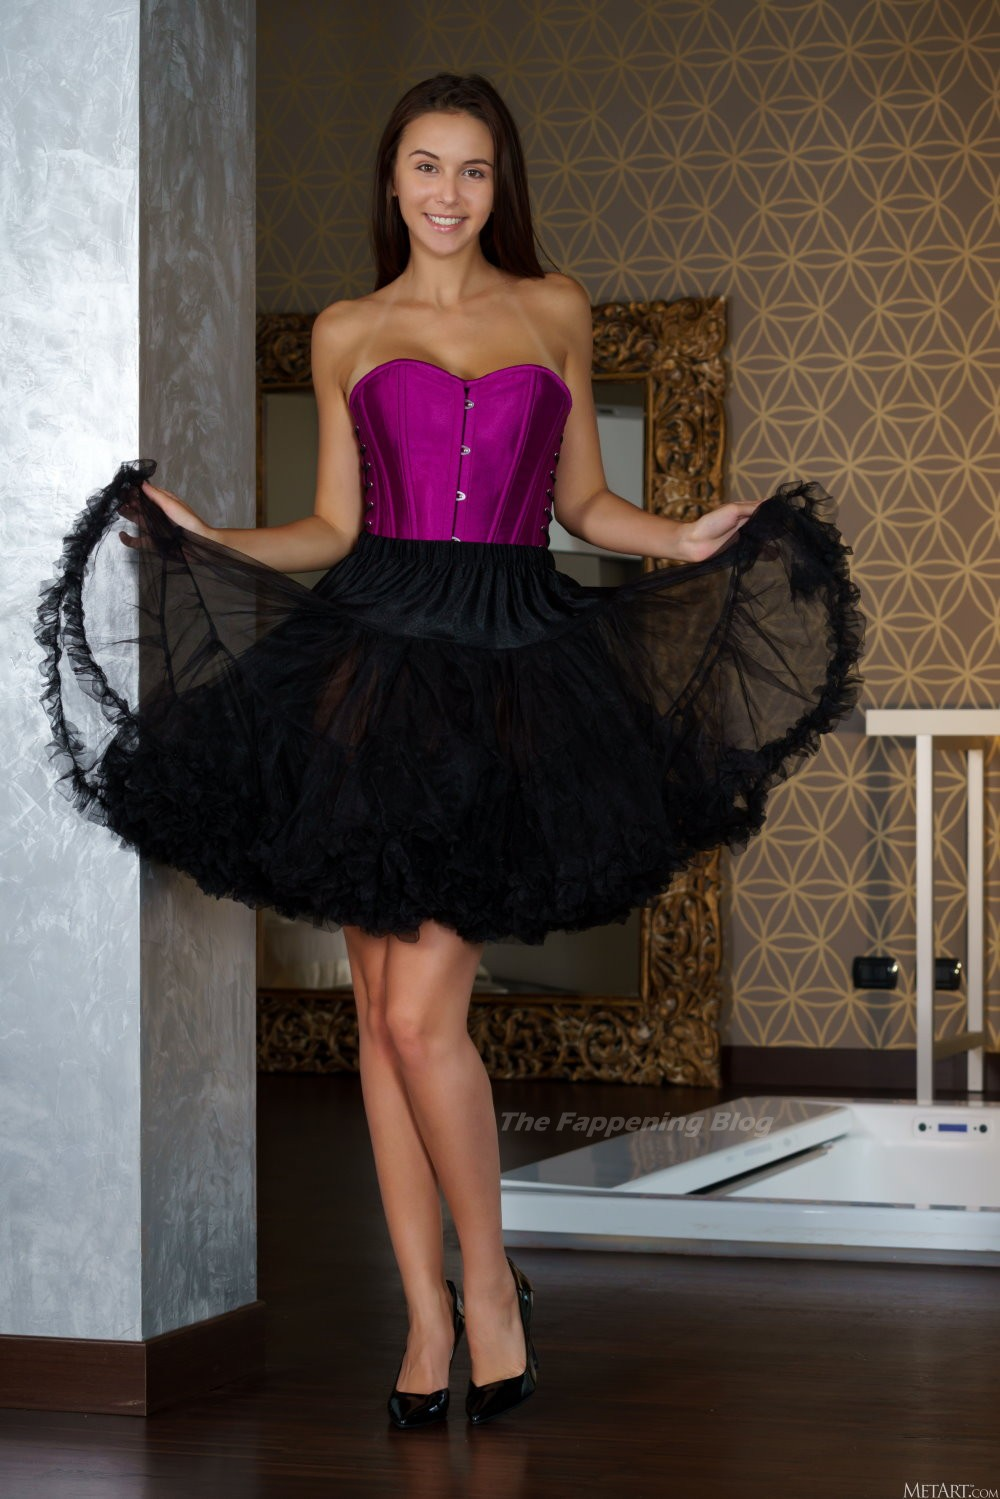 Alisa Amore Nude & Sexy – Petticoat (12 Photos)